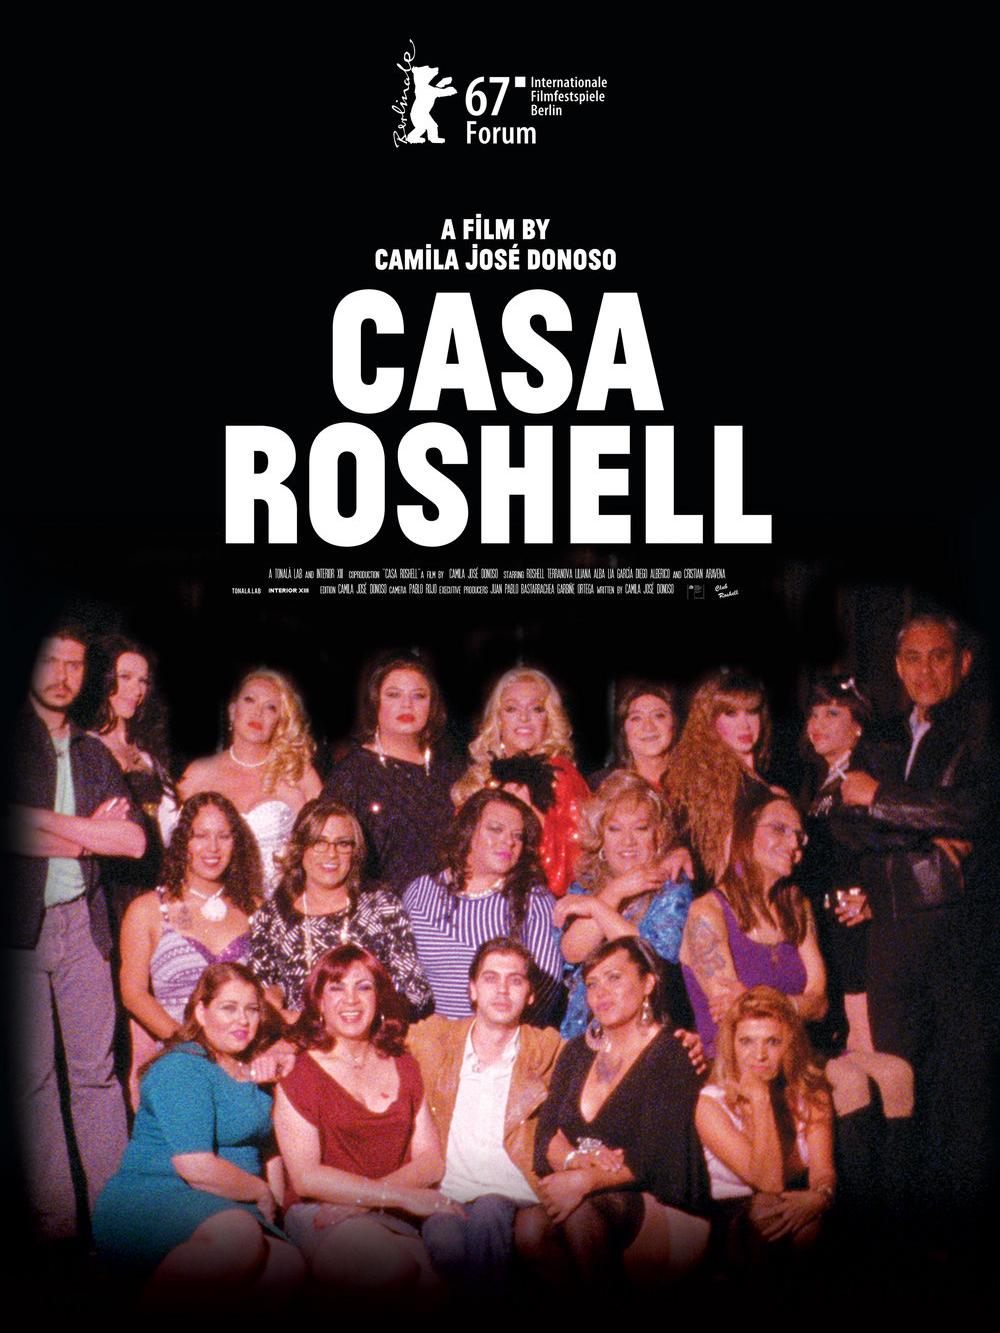 Casa Roshell | Donoso, Camila José (Réalisateur)